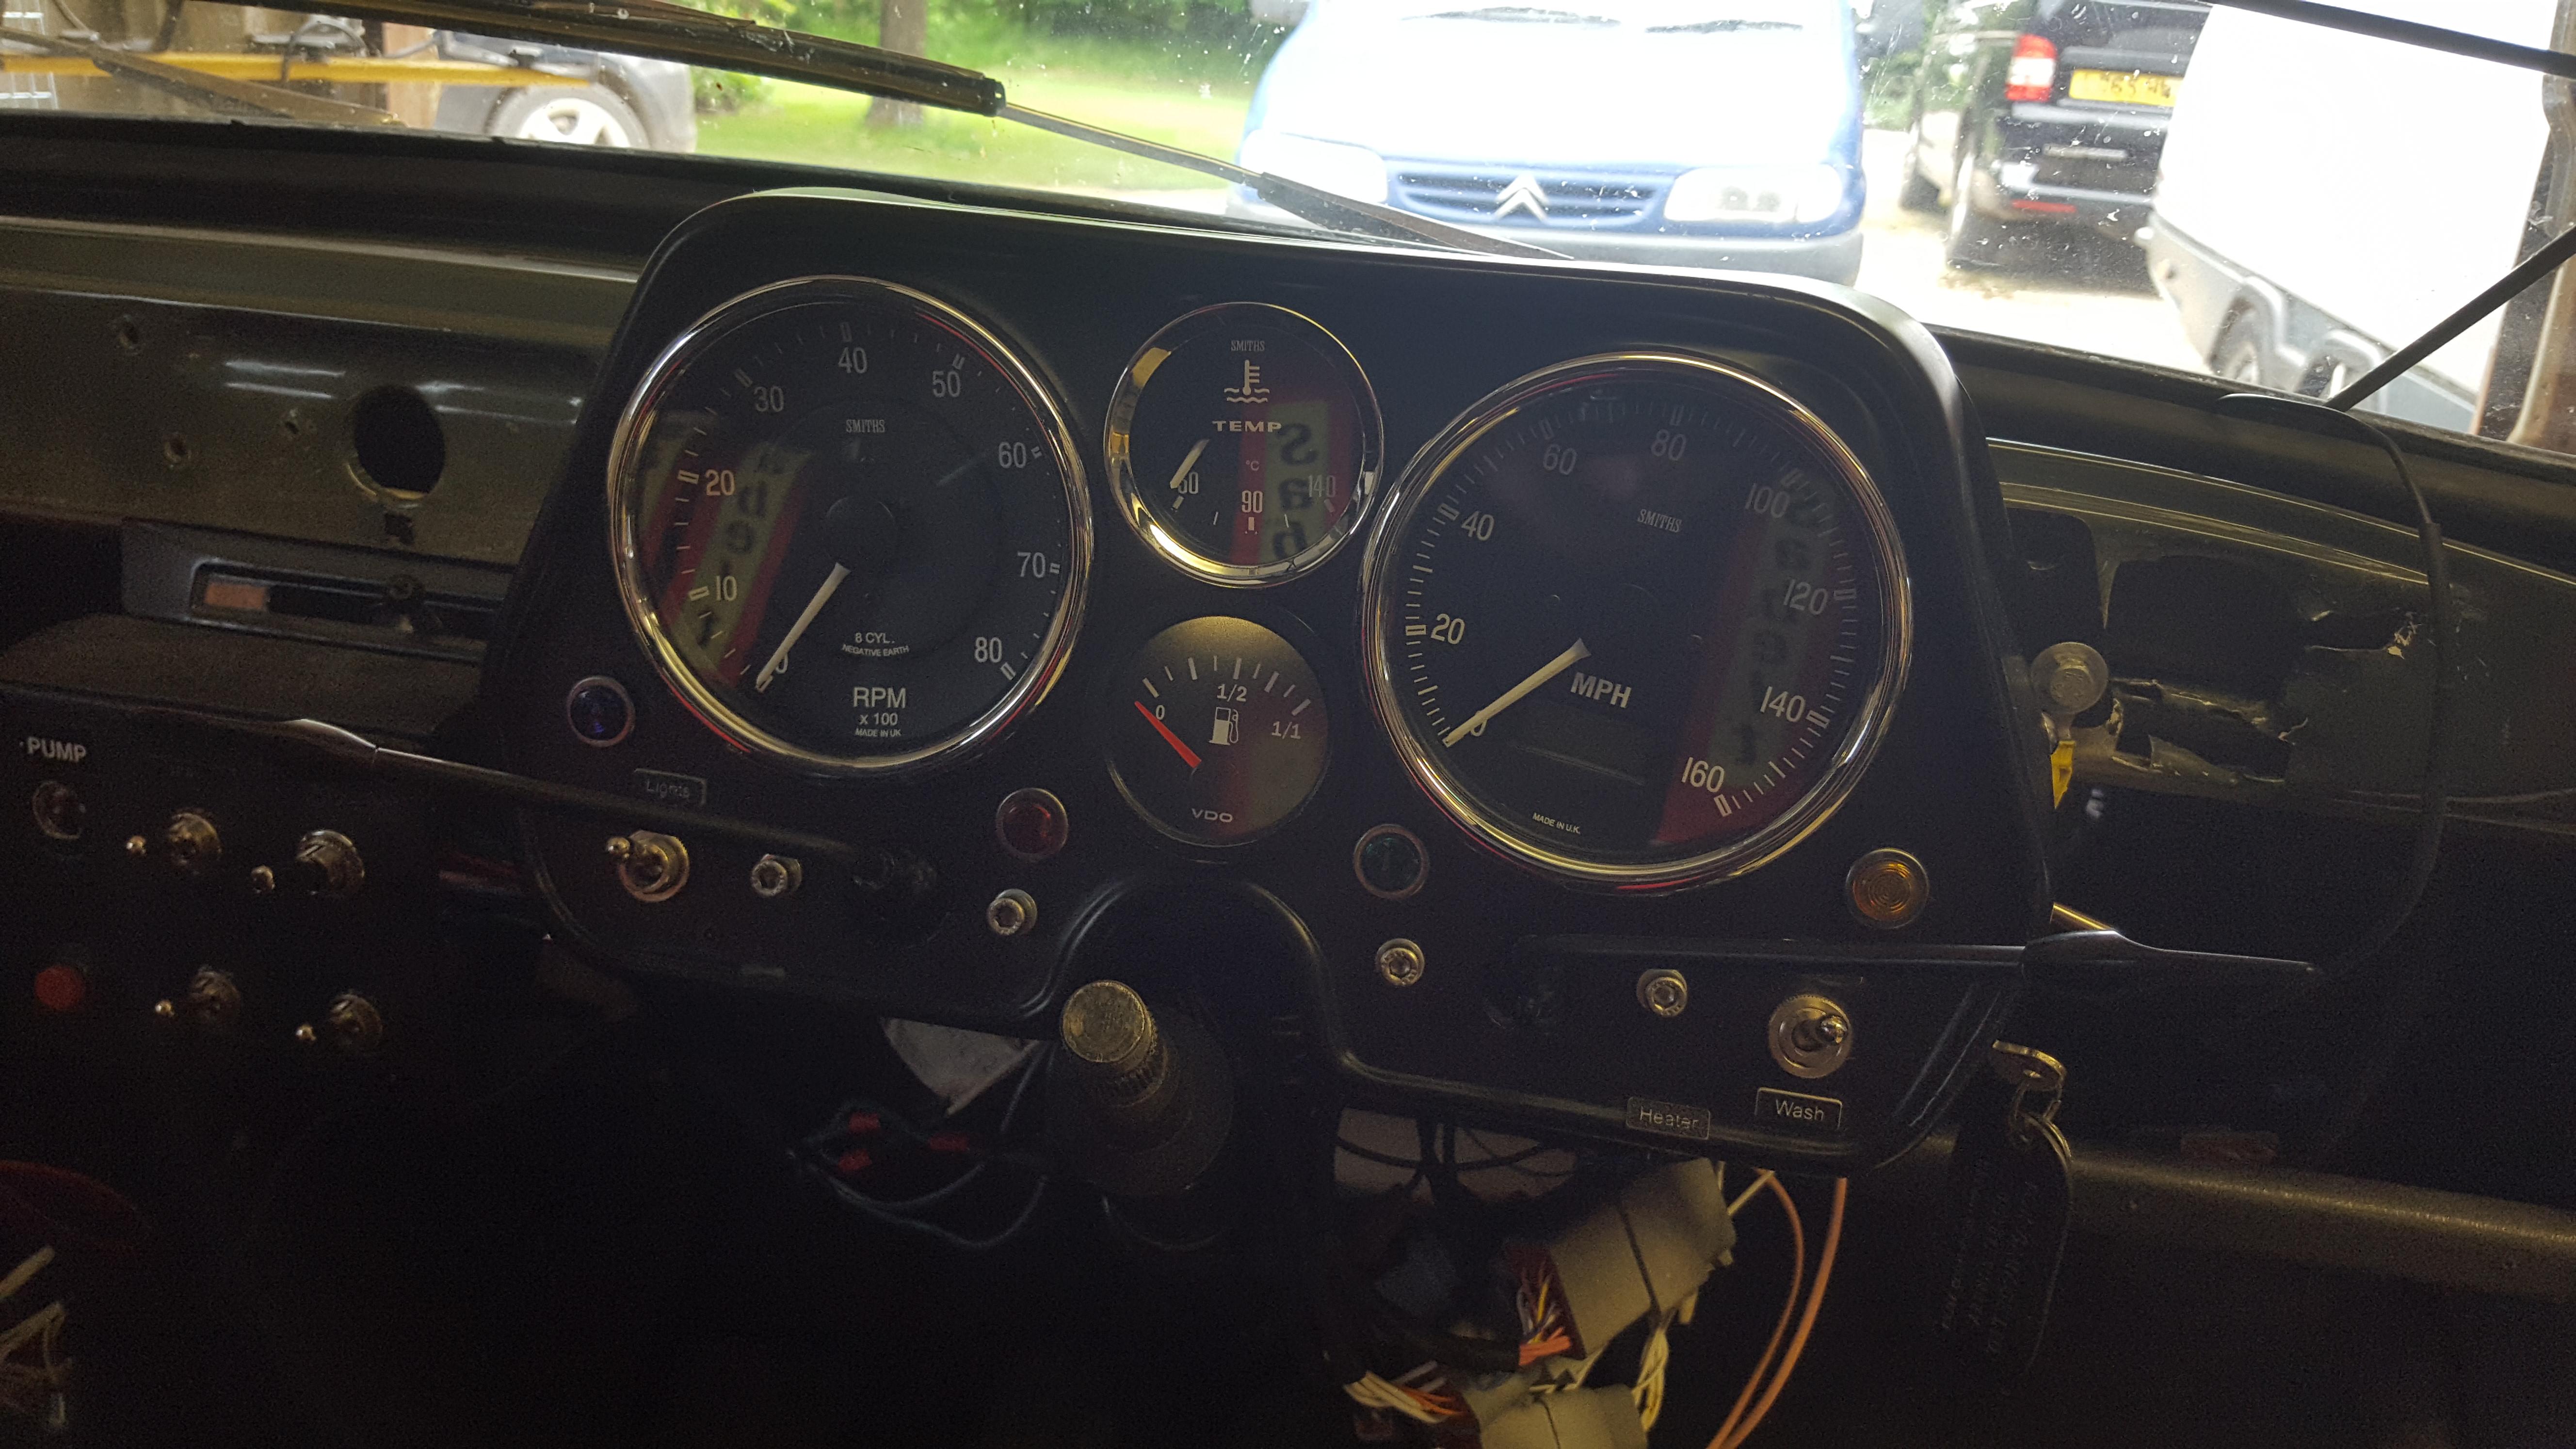 vintagewireman-gallery-classic-rally-car-hillman-imp